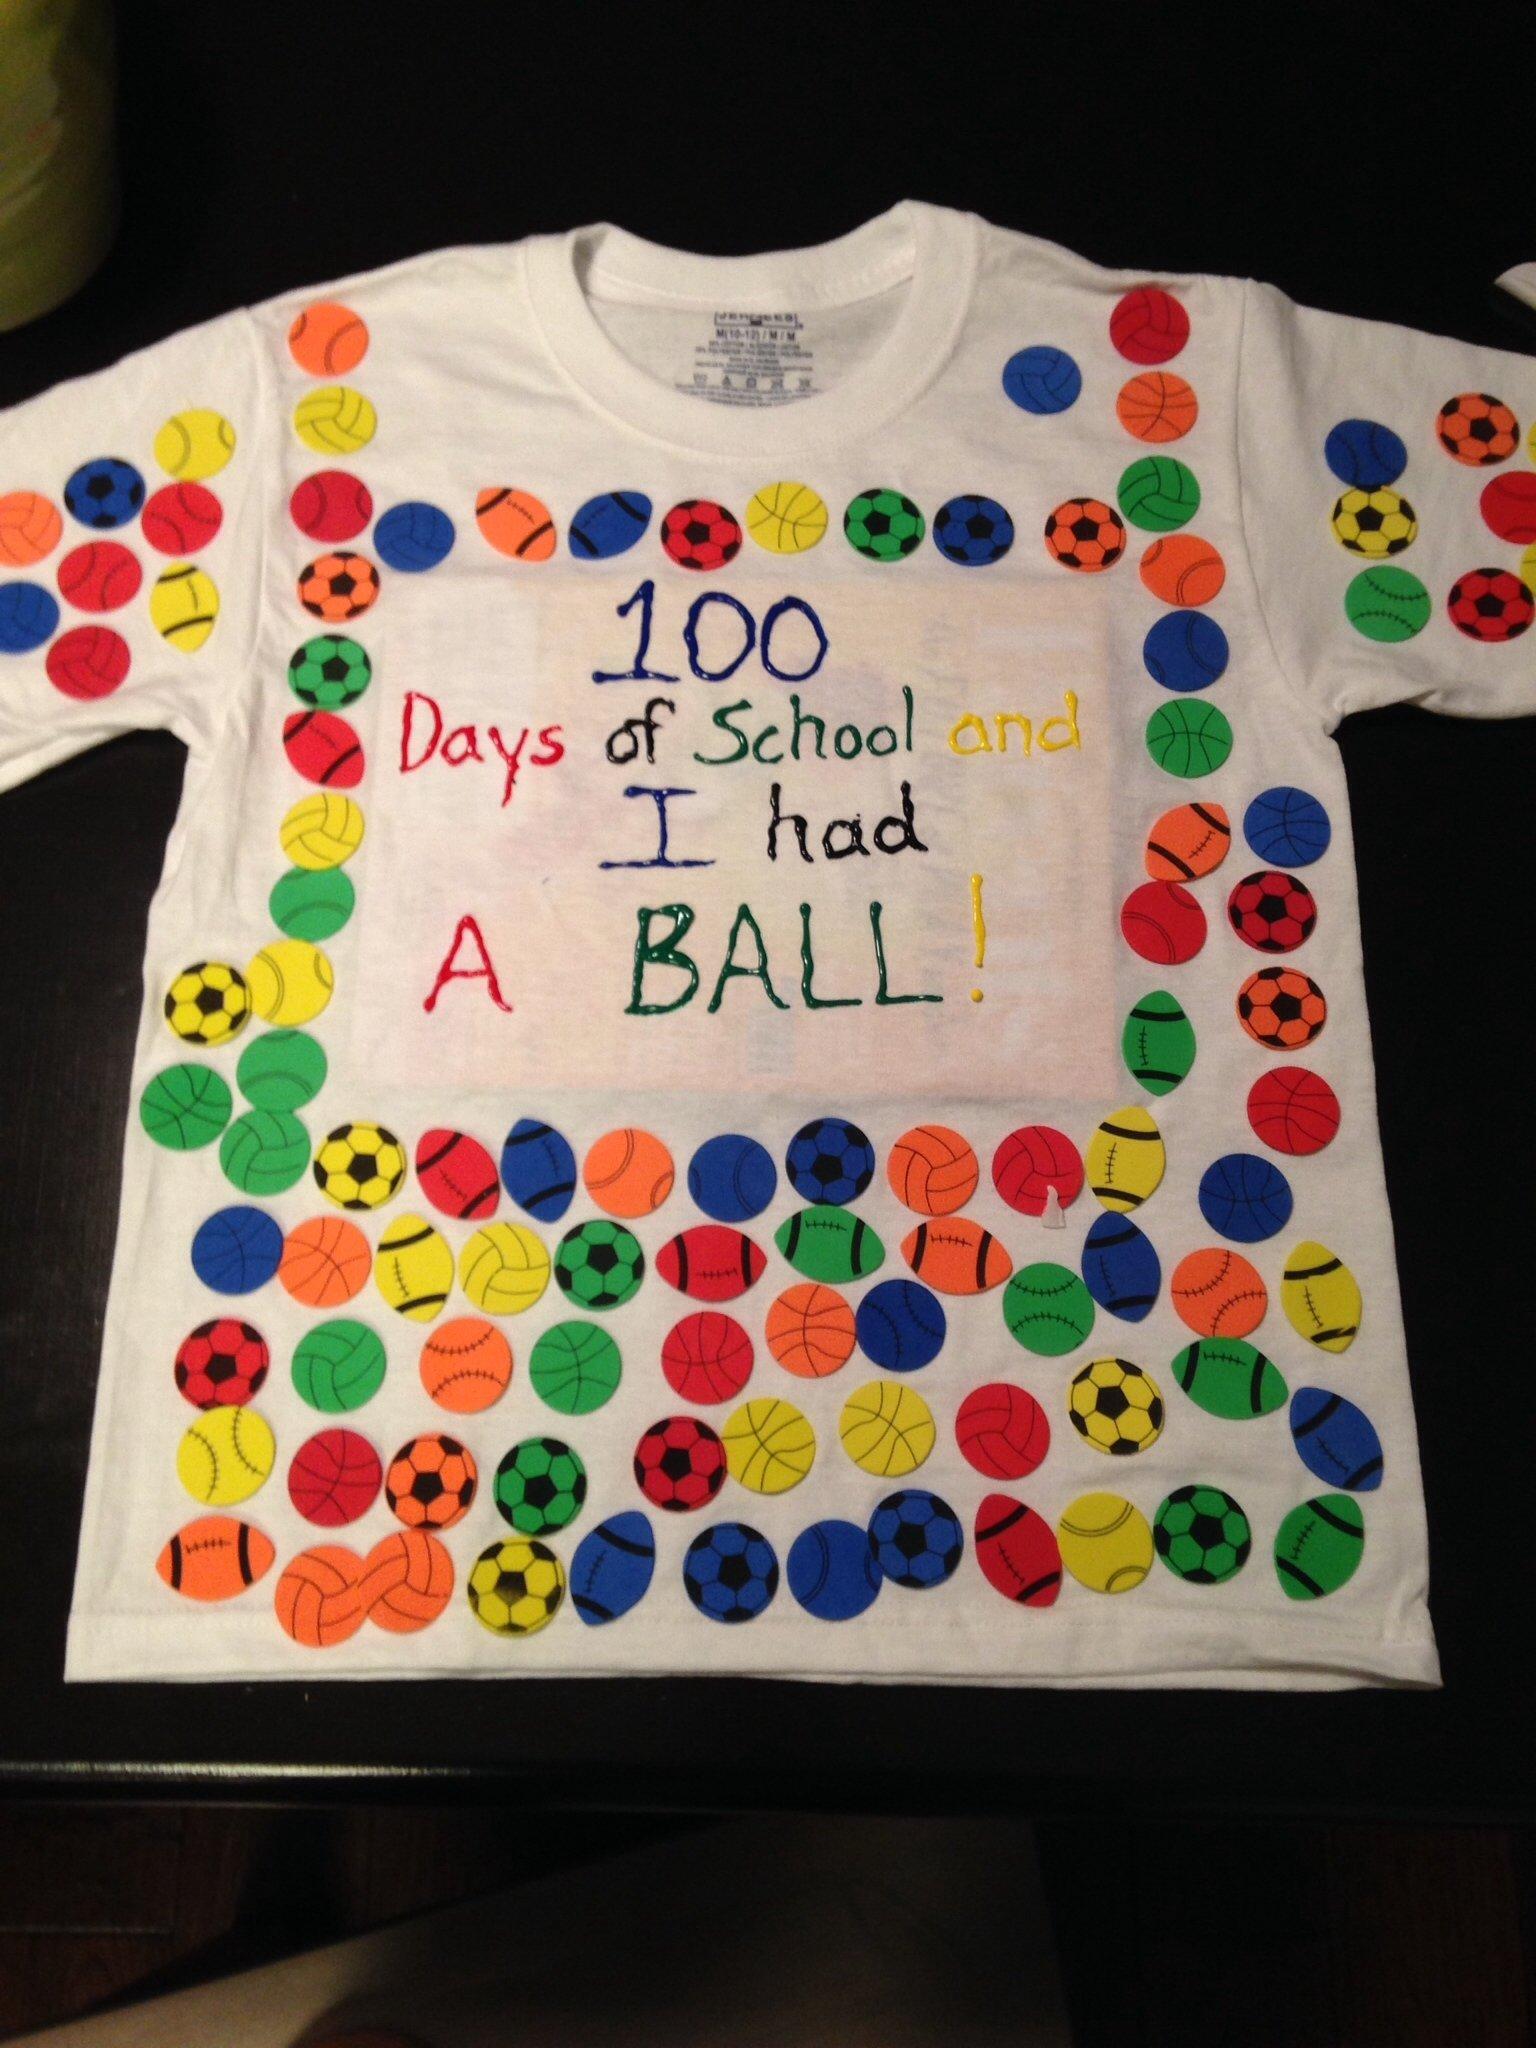 10 Perfect Ideas For 100 Days Of School Project 100 day of school t shirt foam stickers school stuff pinterest 8 2021